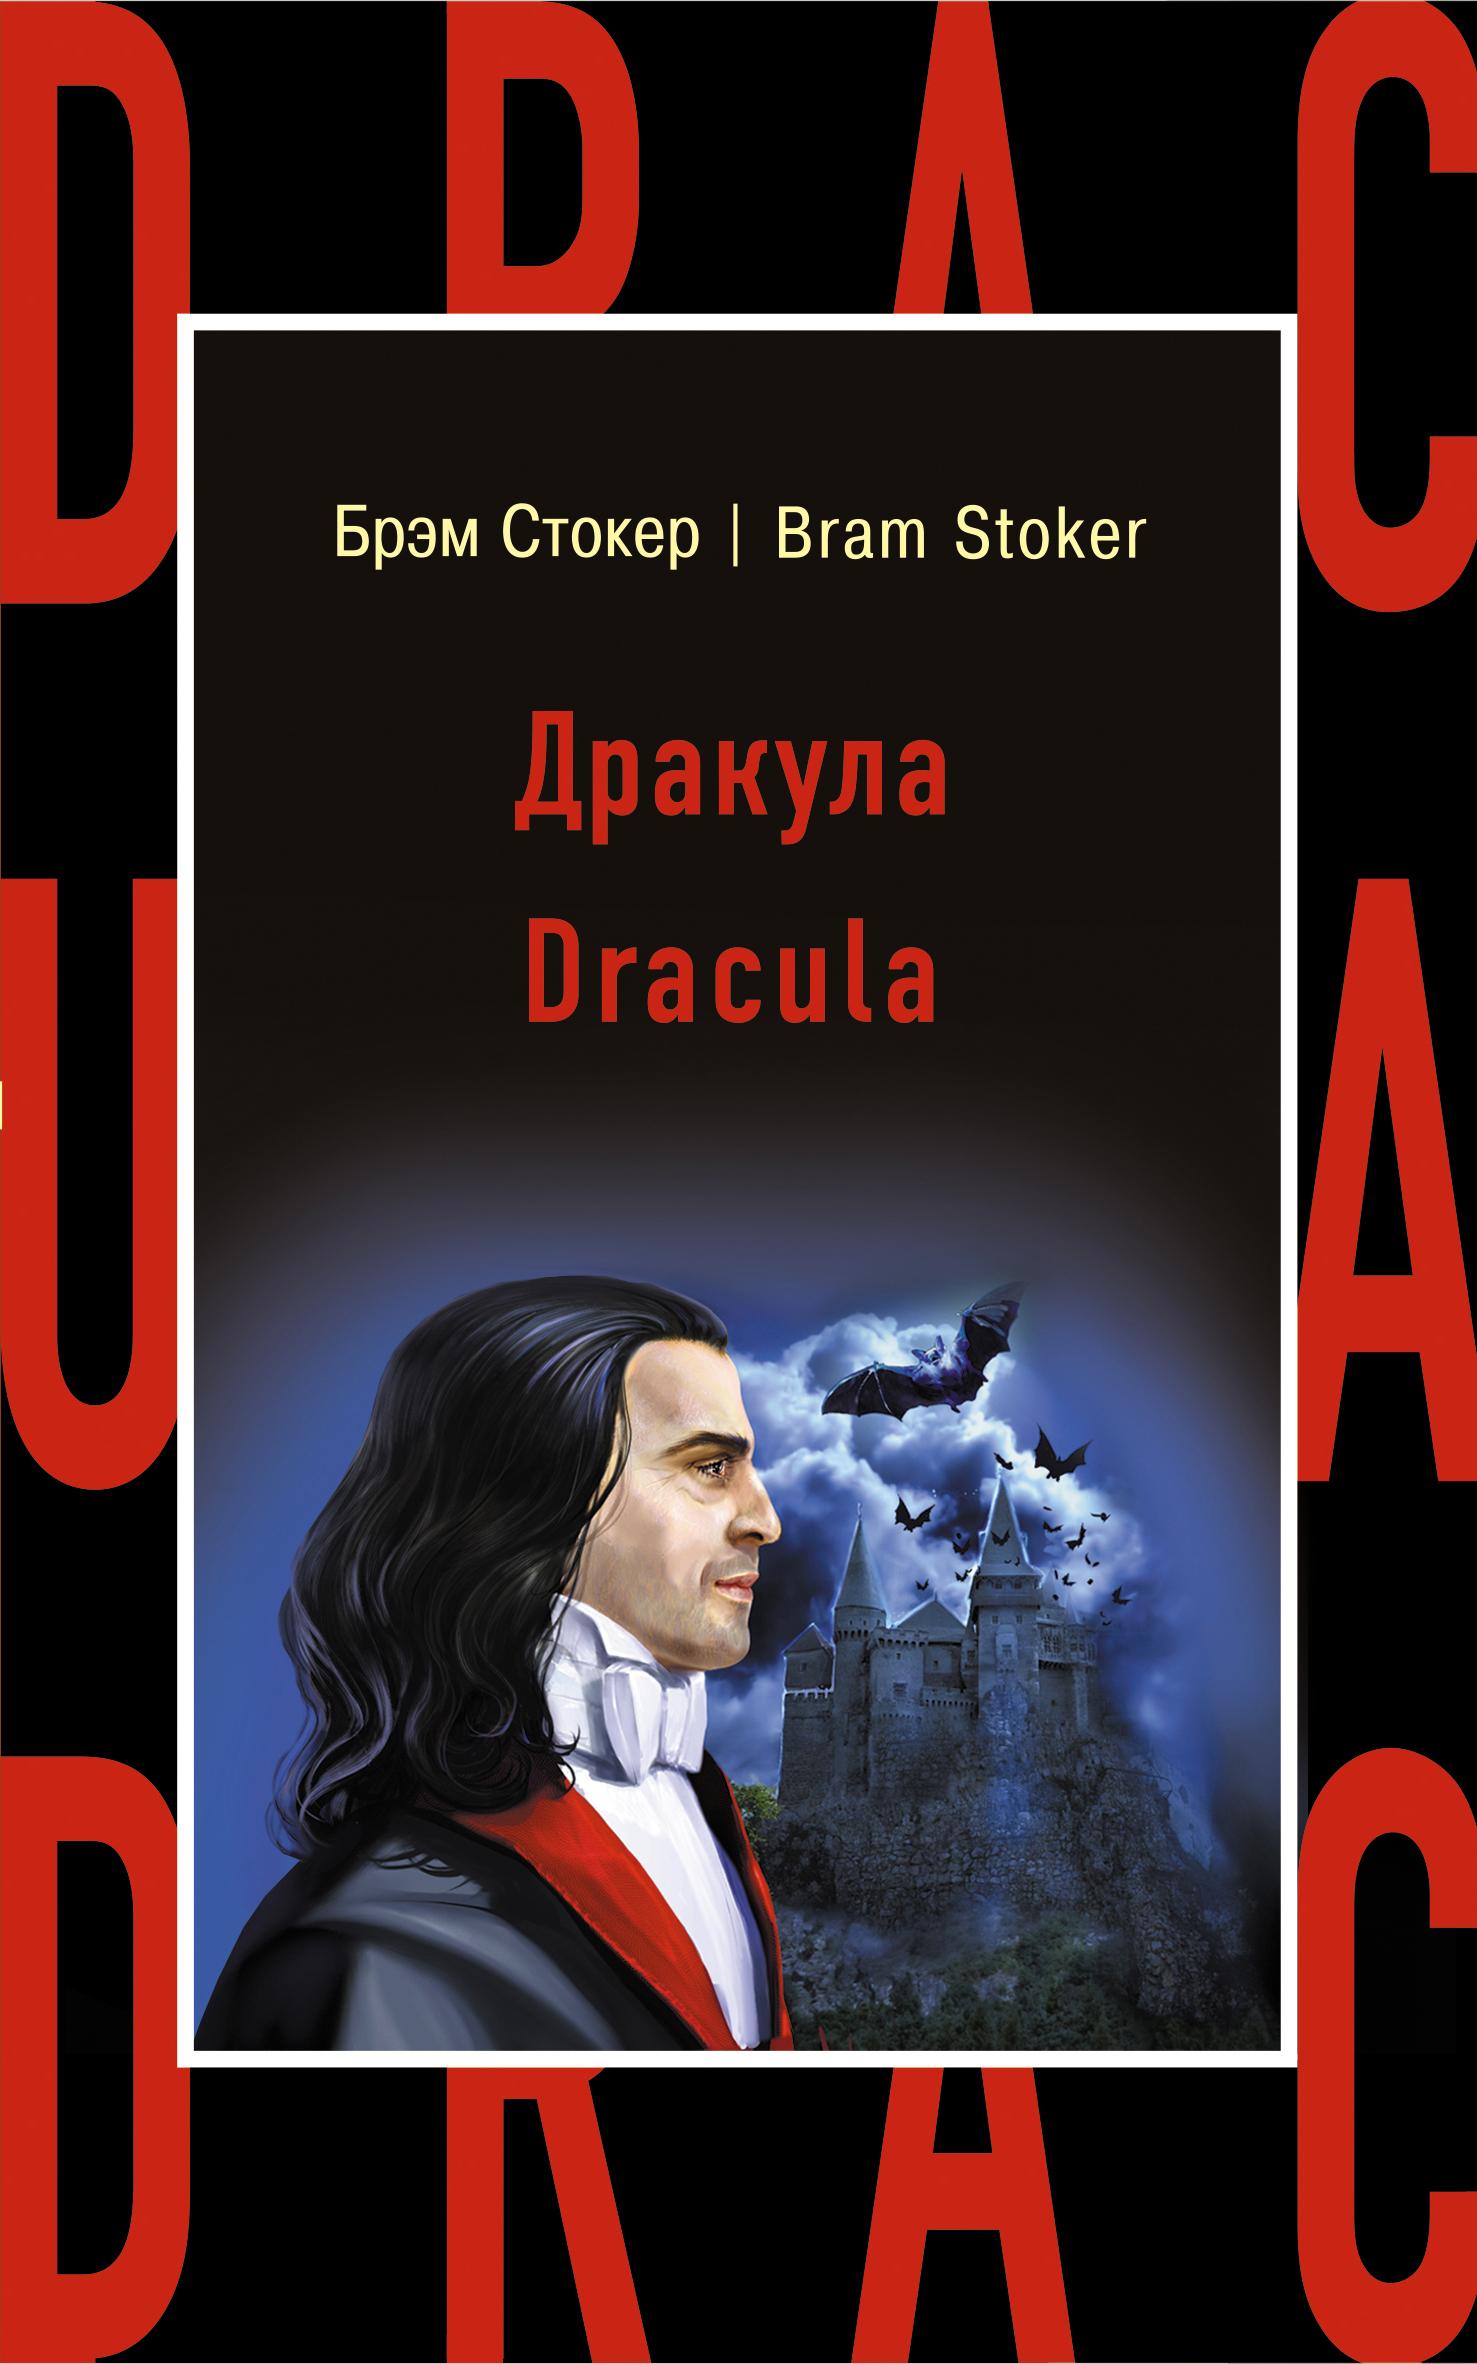 drakula dracula